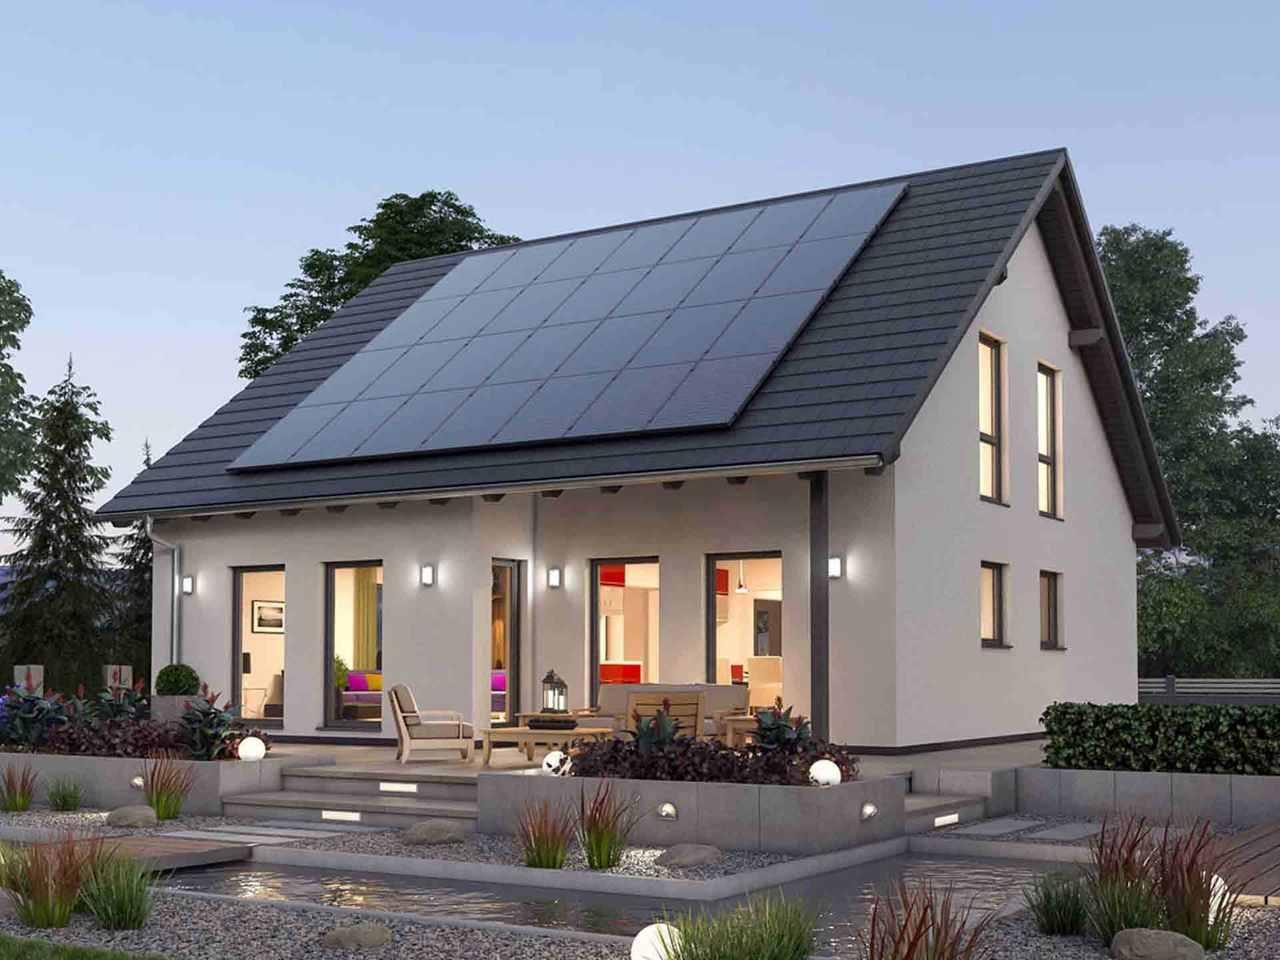 Einfamilienhaus 142 - Ytong Bausatzhaus Terrasse